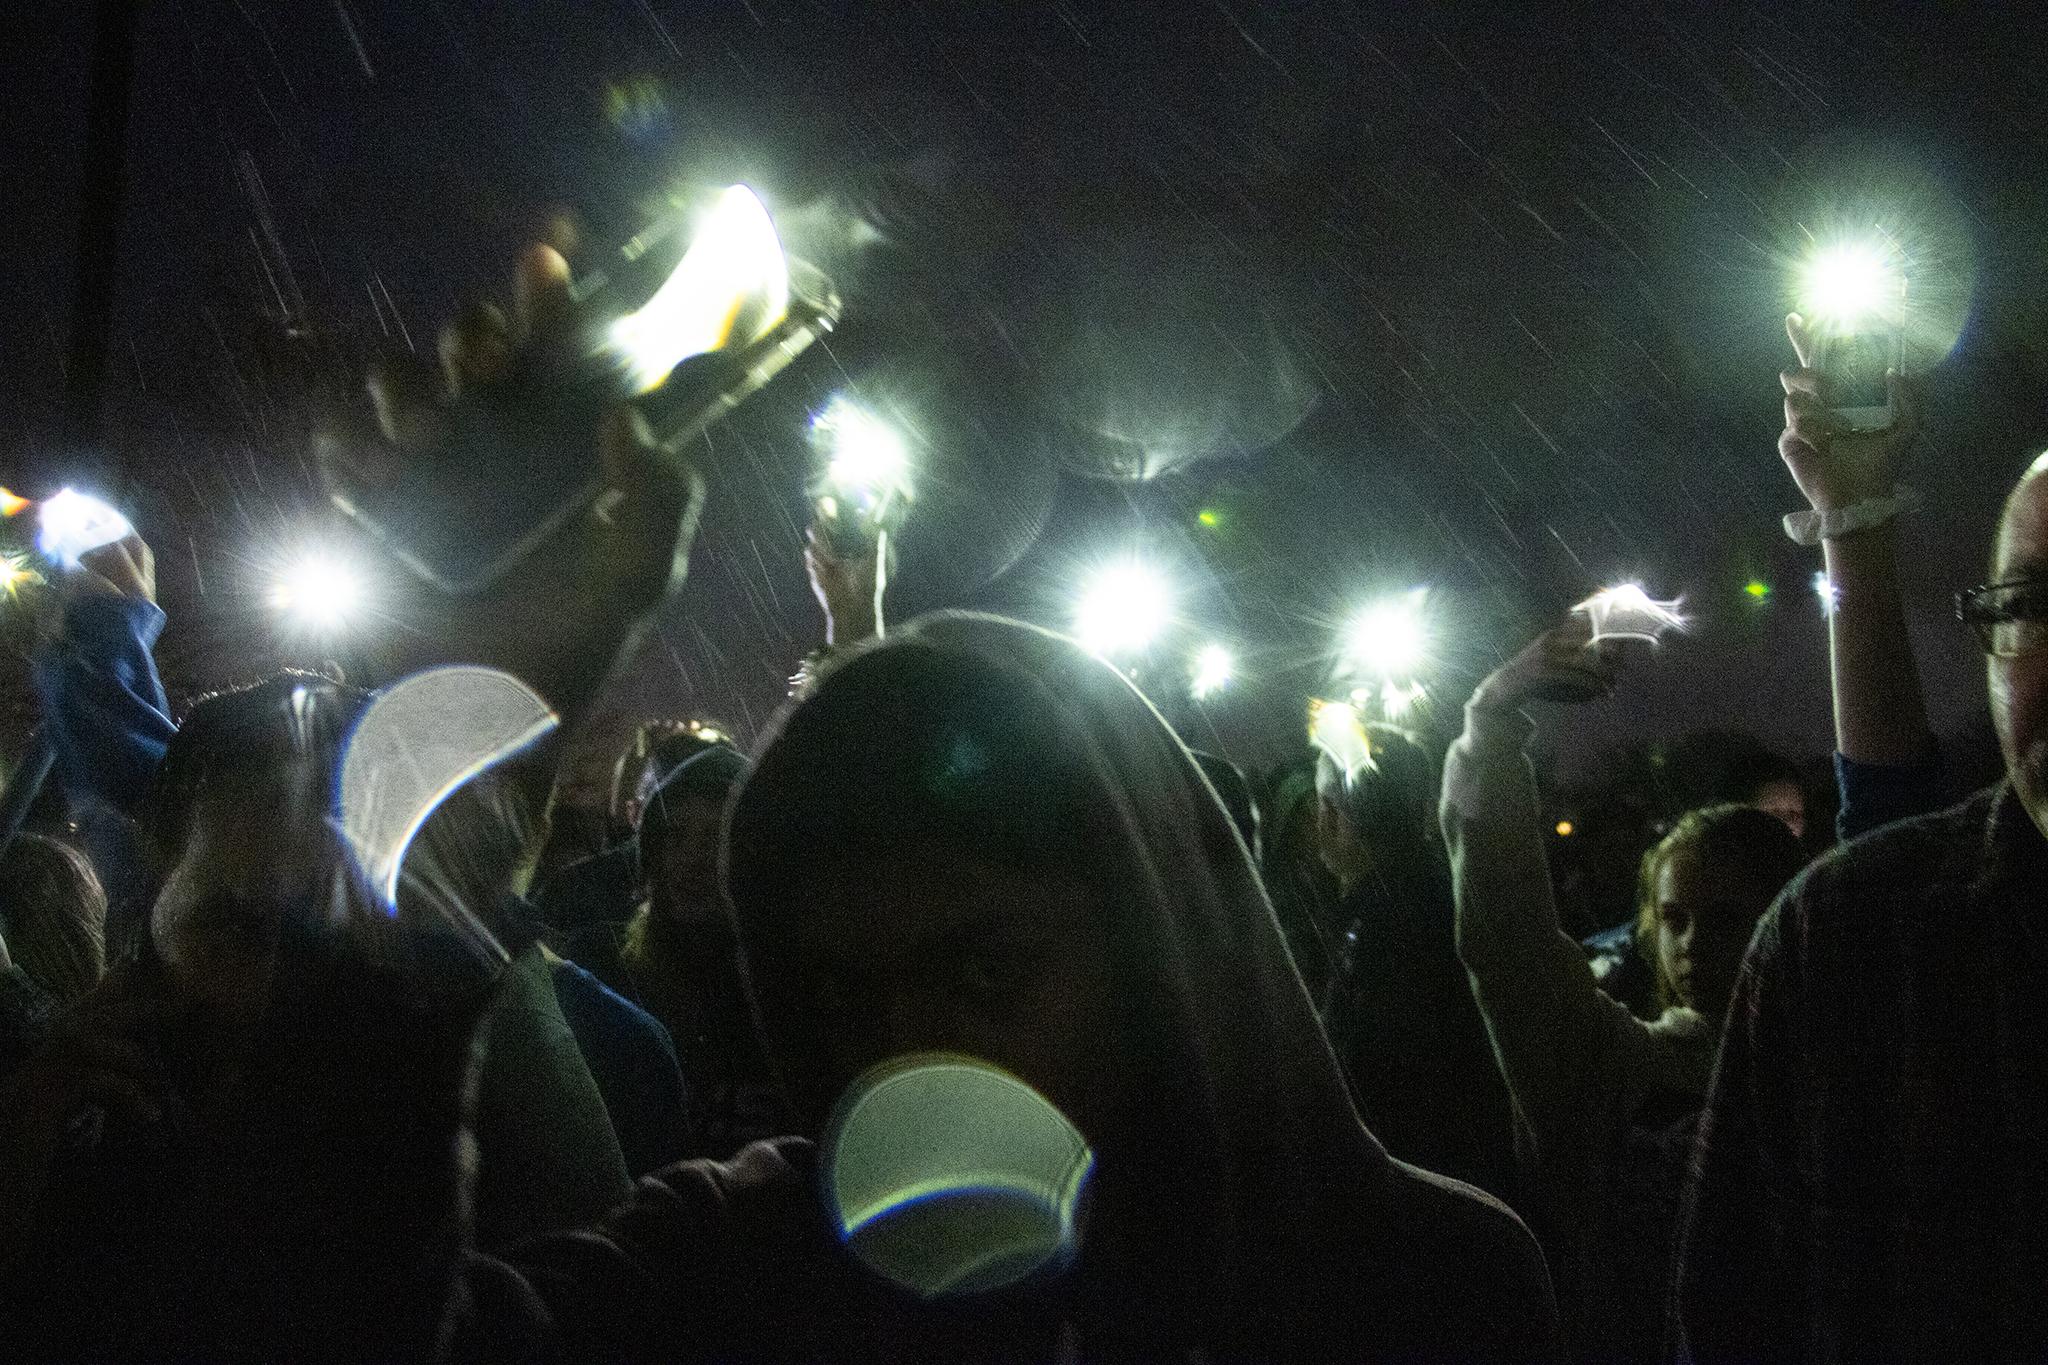 Photo: STEM School Highlands Ranch shooting vigil - outside